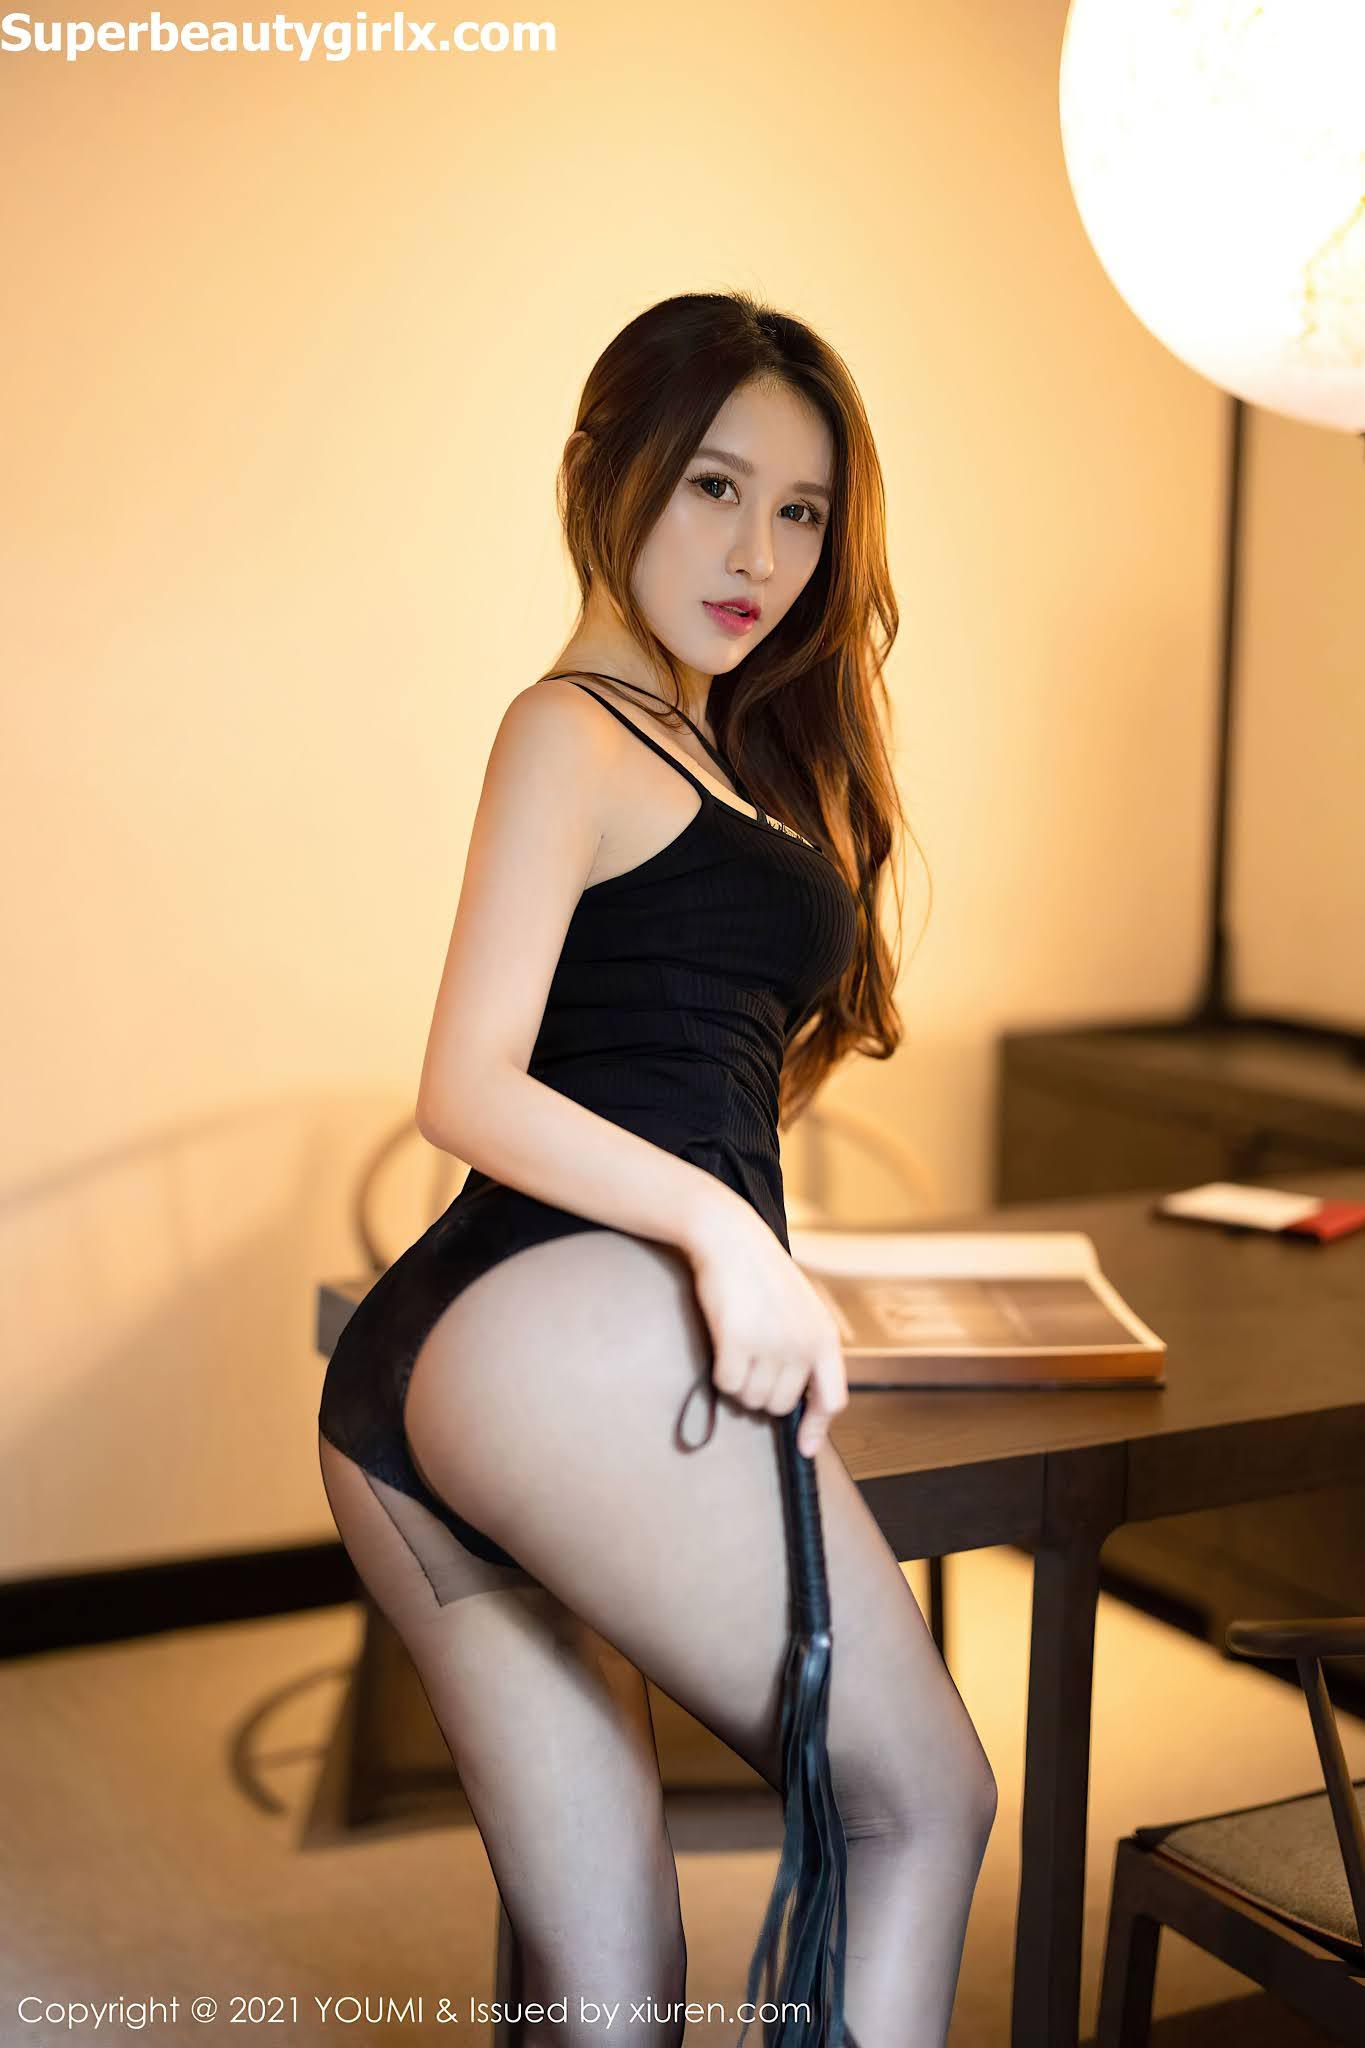 YouMi-Vol.595-Xu-An-An-Superbeautygirlx.com